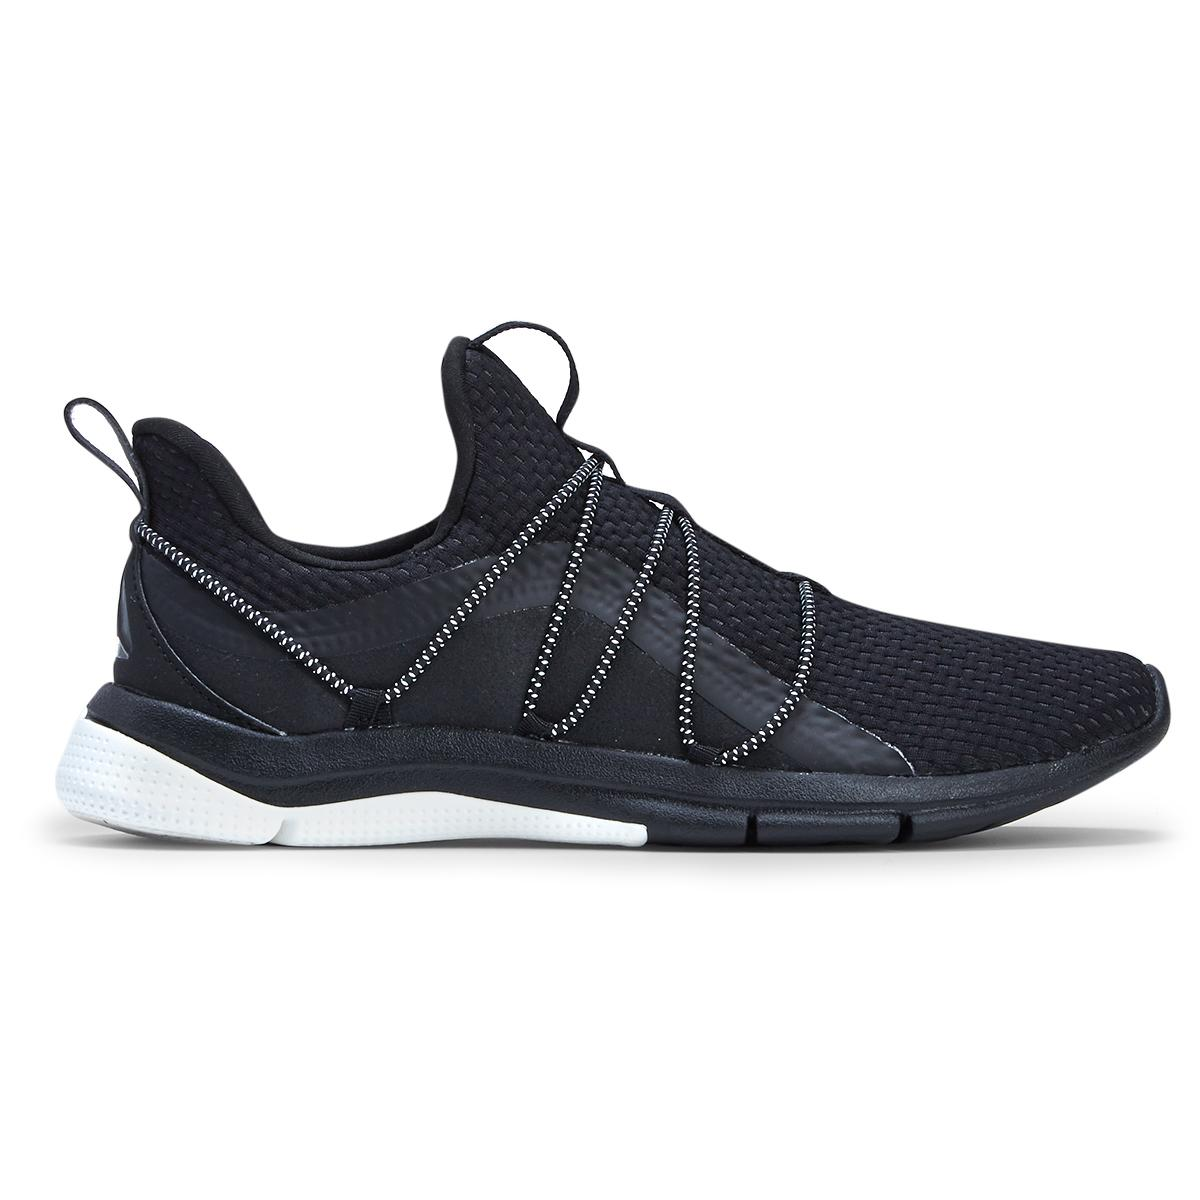 Jual Sepatu   Pakaian Olahraga Reebok  9c9321a391